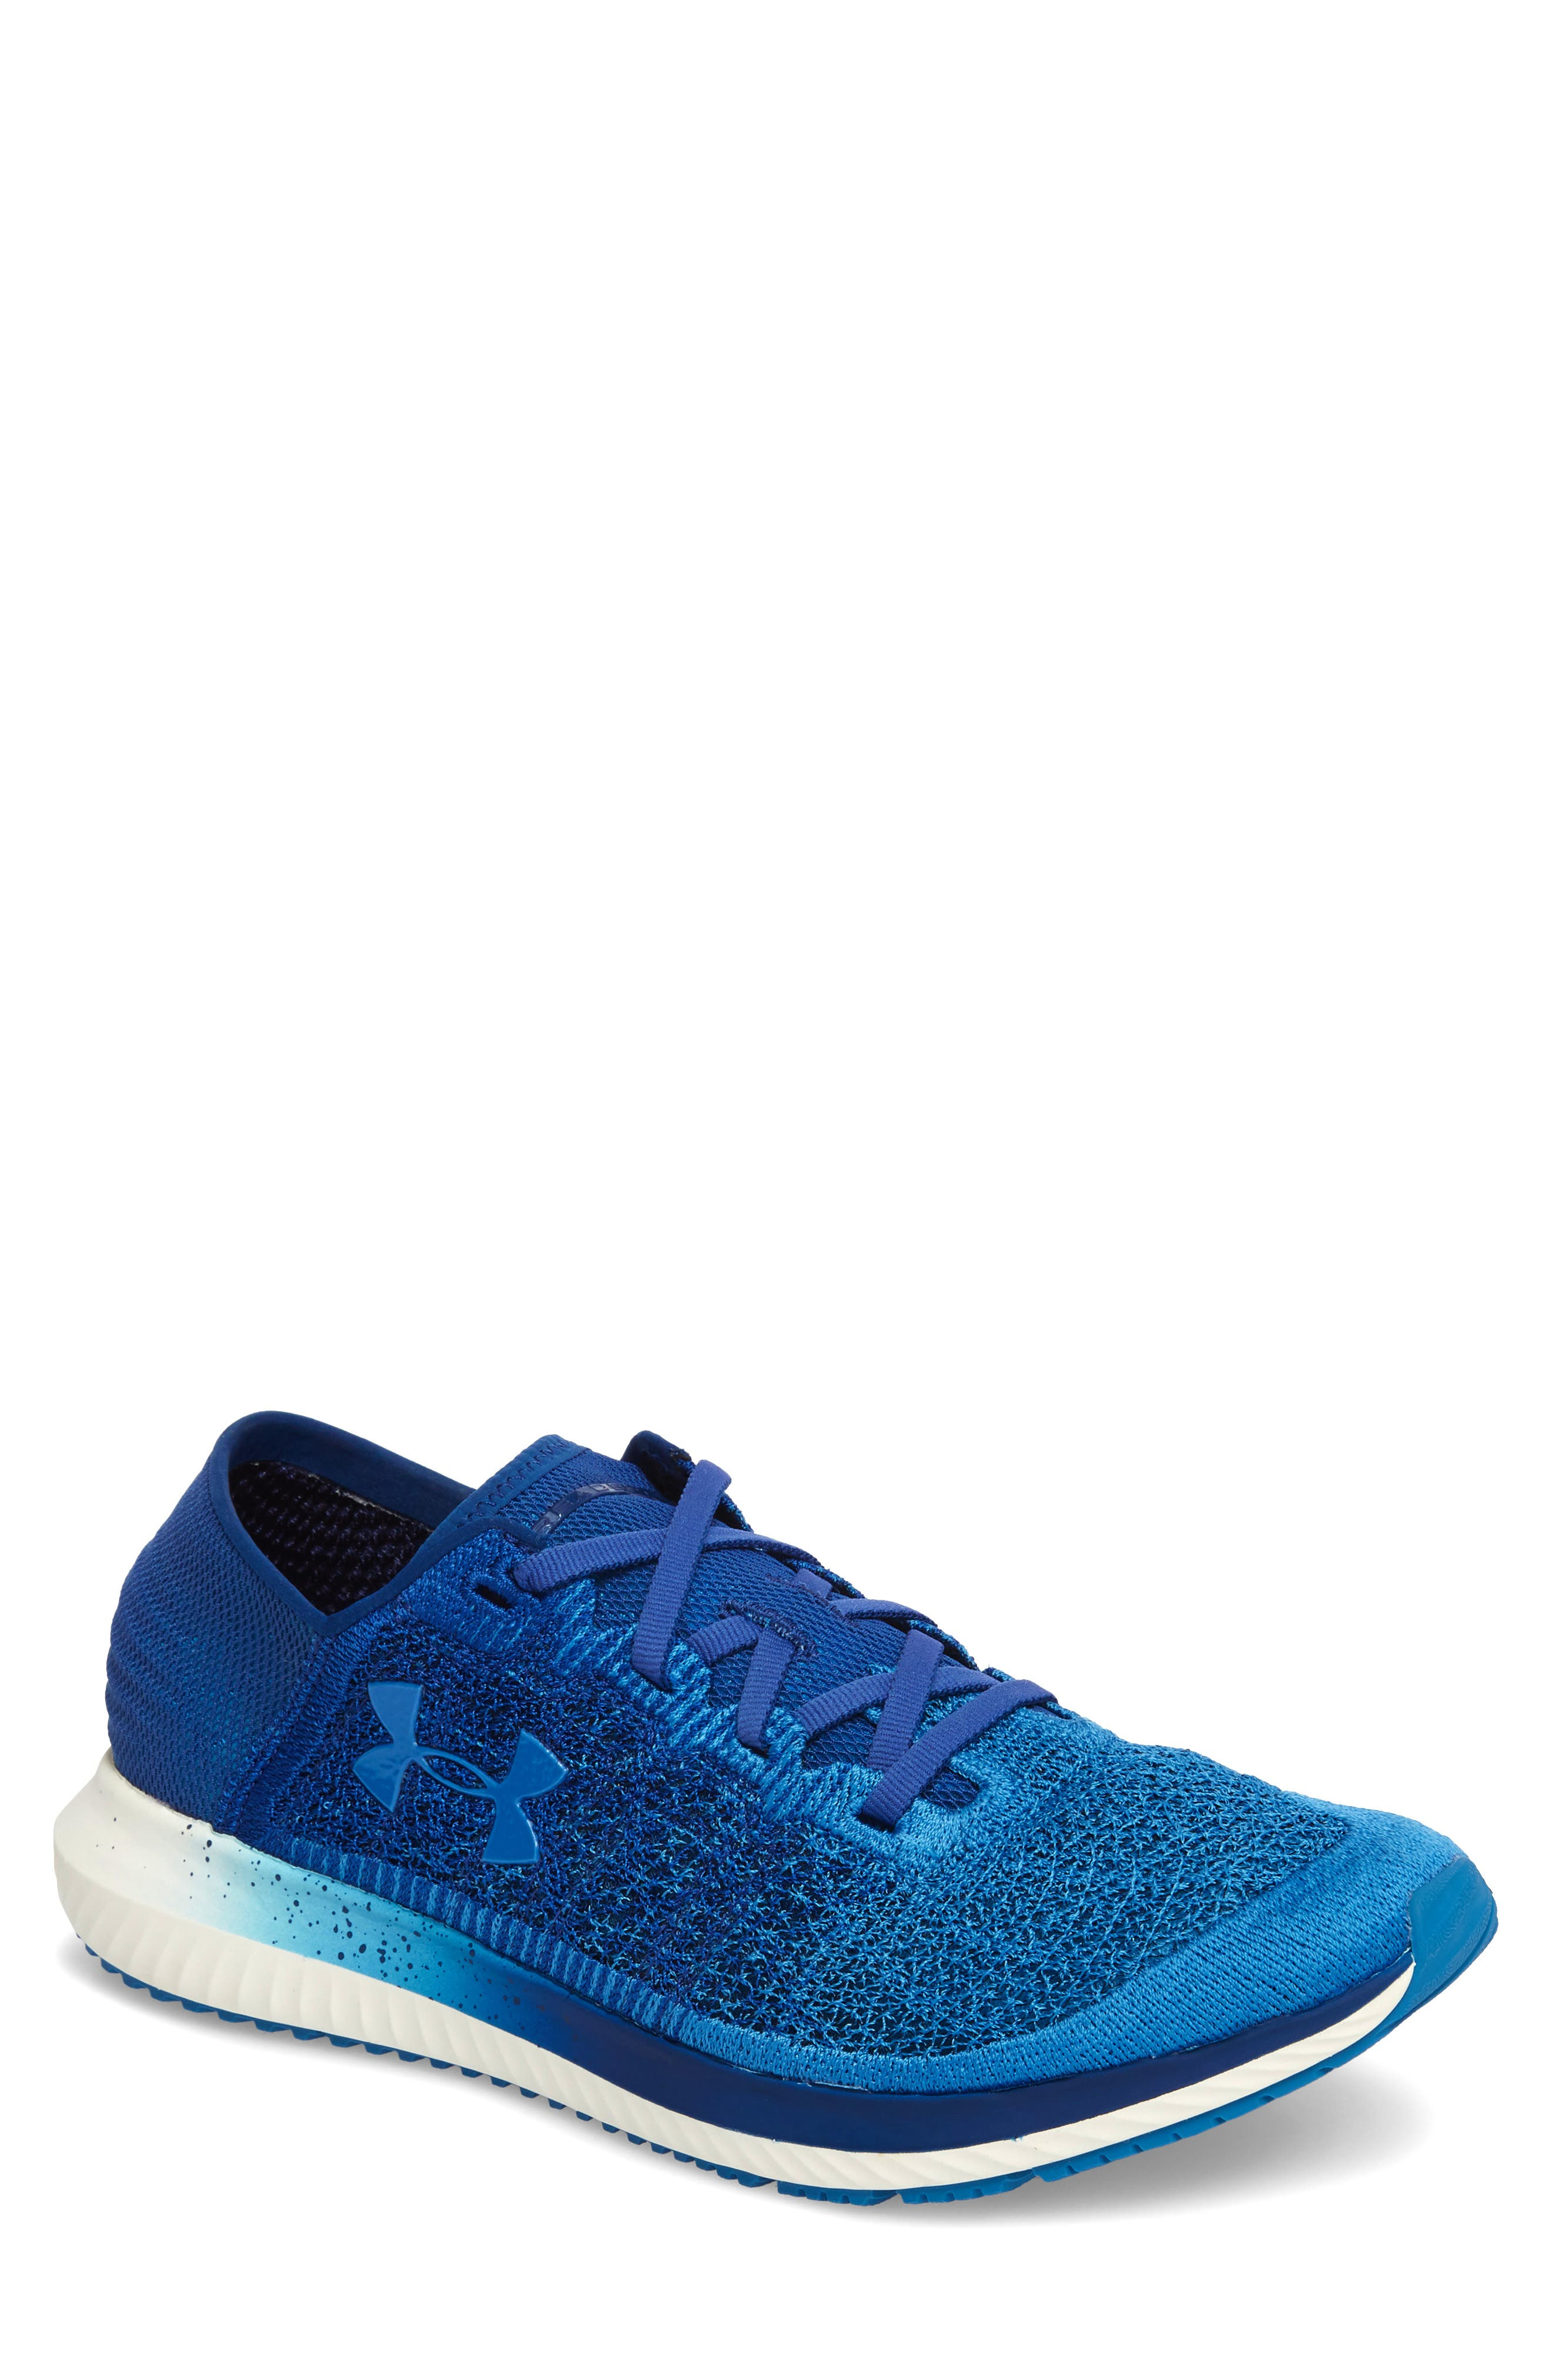 UNDER ARMOUR Threadborne Blur Running Shoe, Main, color, 400